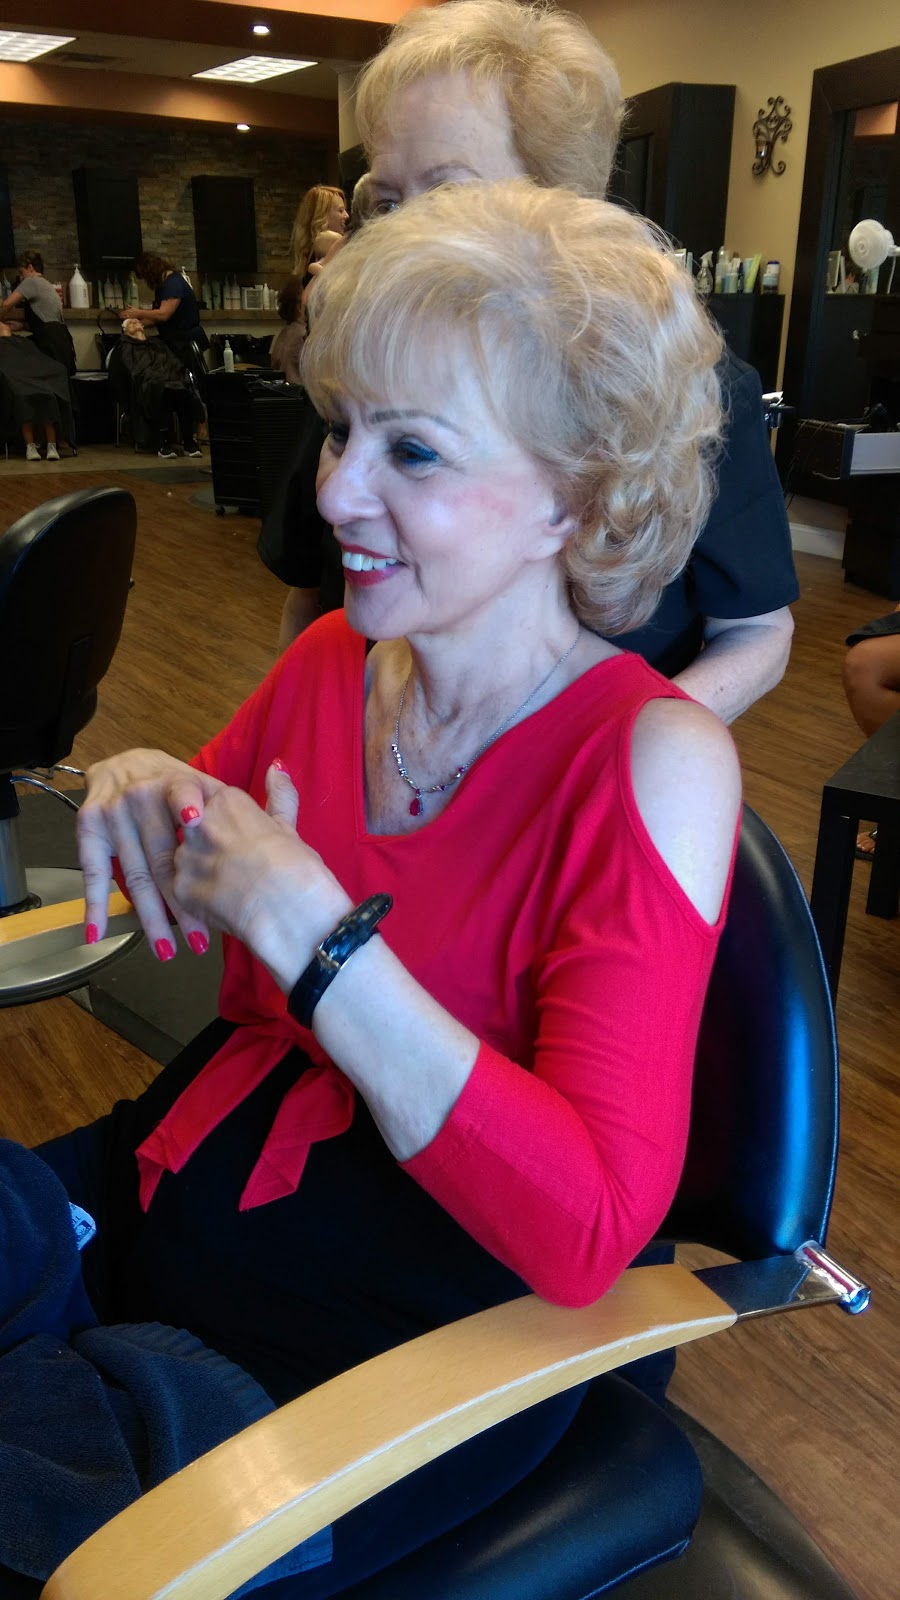 J. Maries Hair Salon - hair care  | Photo 2 of 2 | Address: 30436 Euclid Ave, Wickliffe, OH 44092, USA | Phone: (440) 943-2662